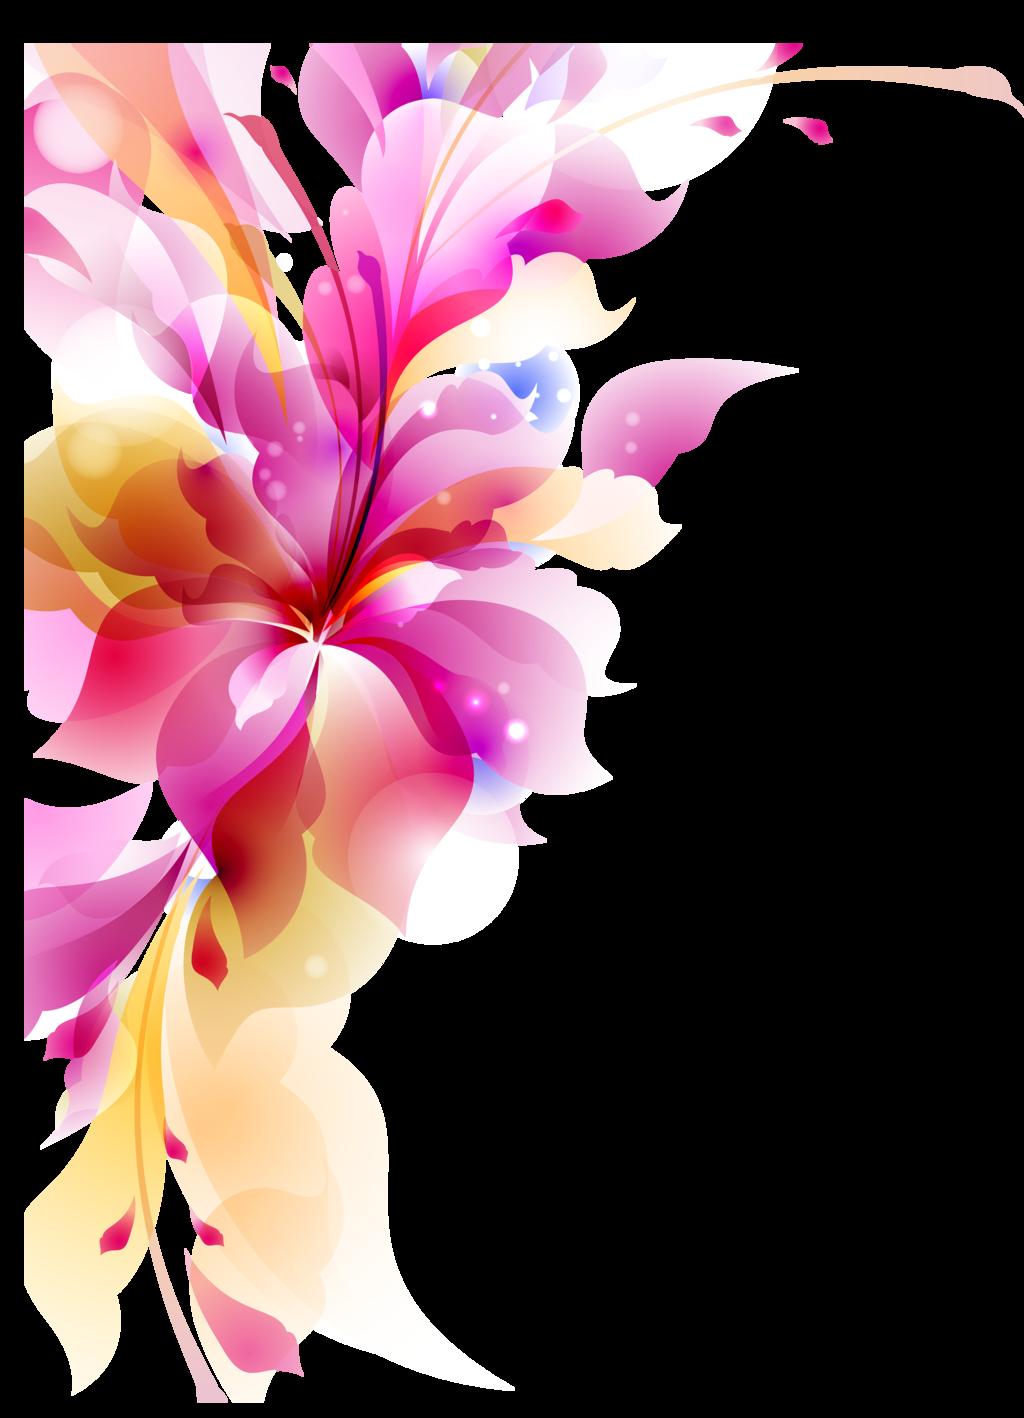 Abstract Flower Transparent 16421 Transparentpng